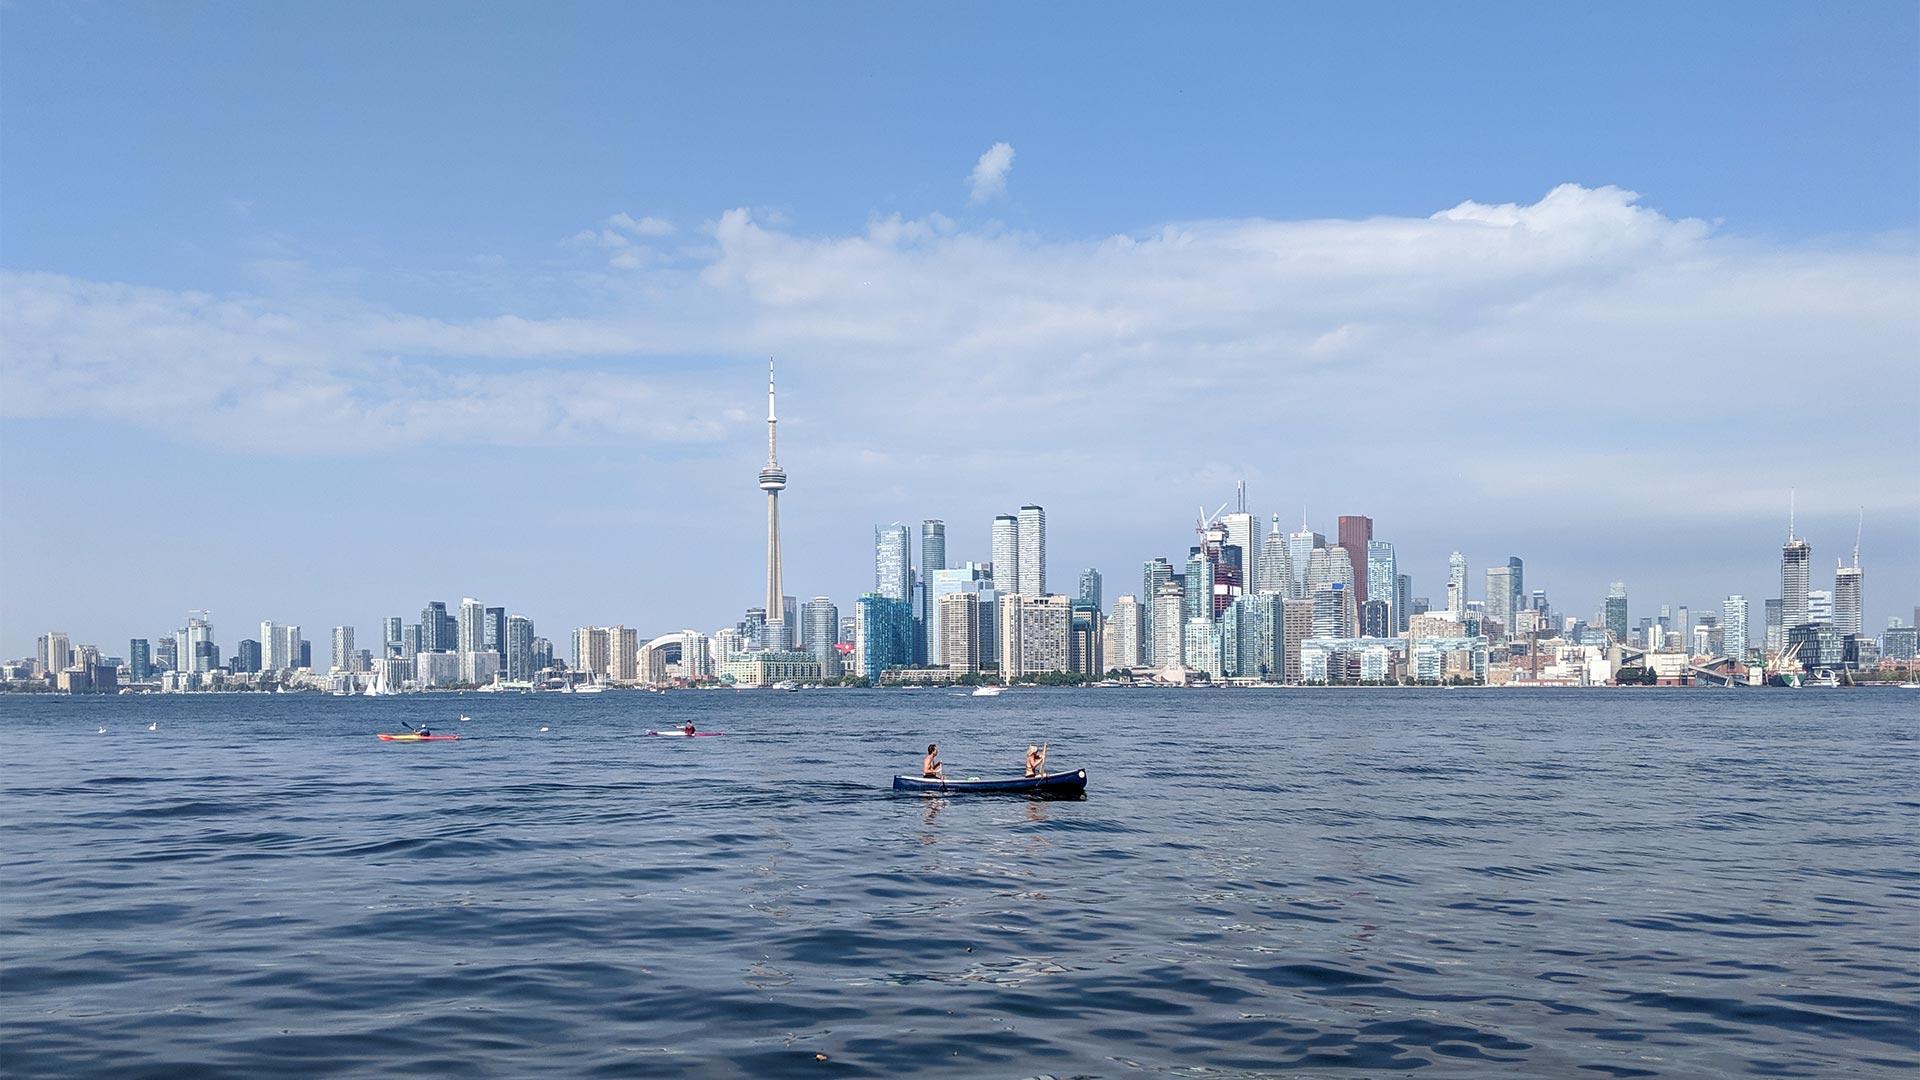 Toronto skyline from the Islands